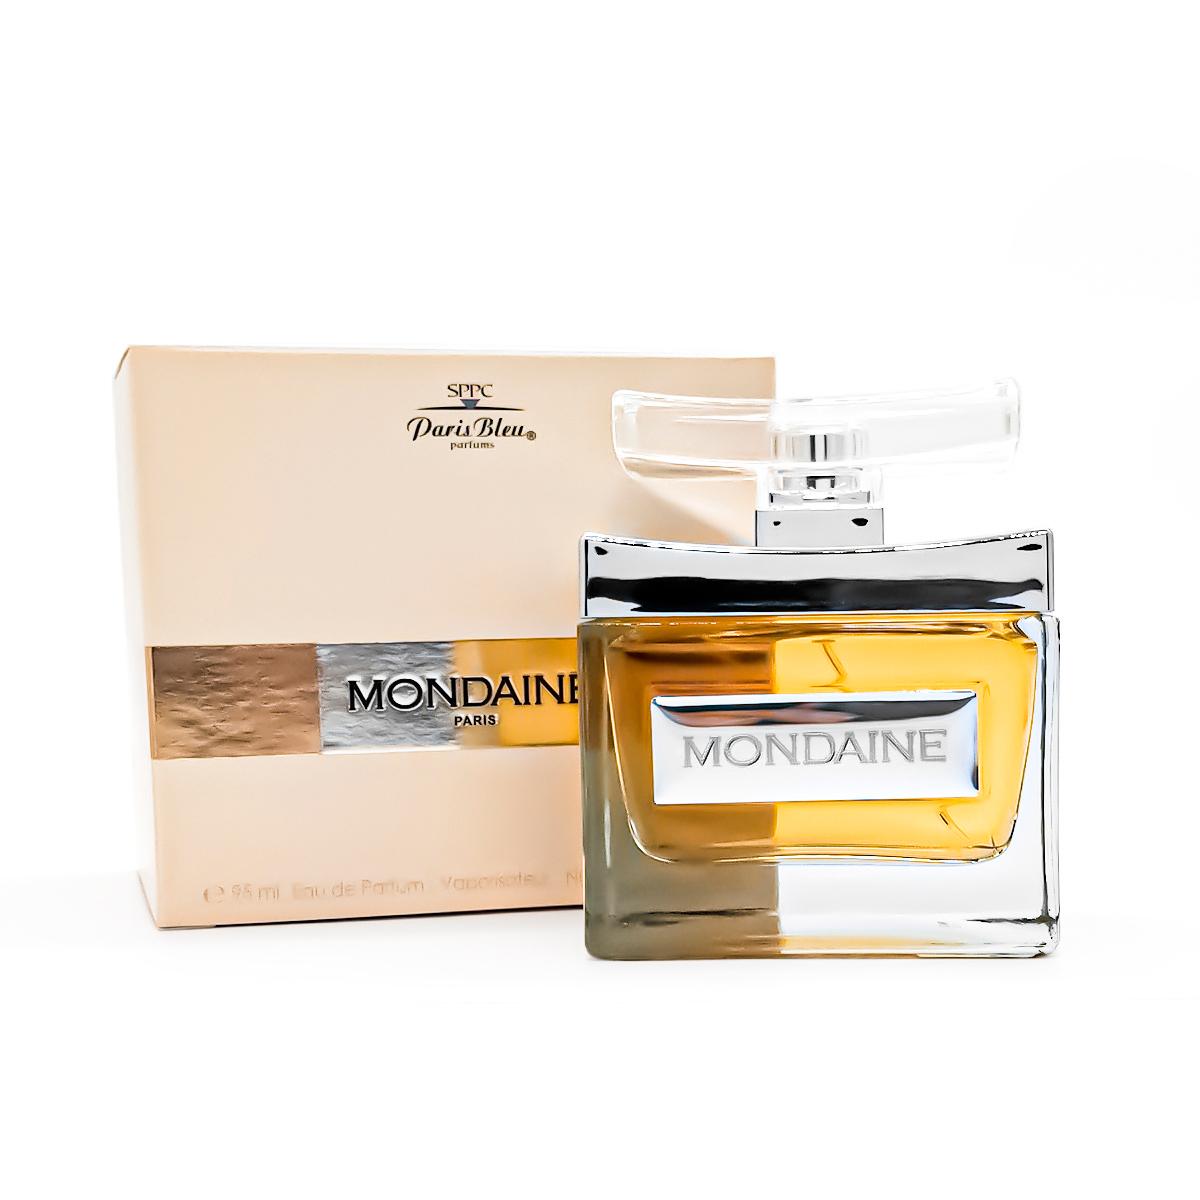 Perfume Mondaine Feminino Edp 95ml Paris Bleu  - Mercari Perfumes